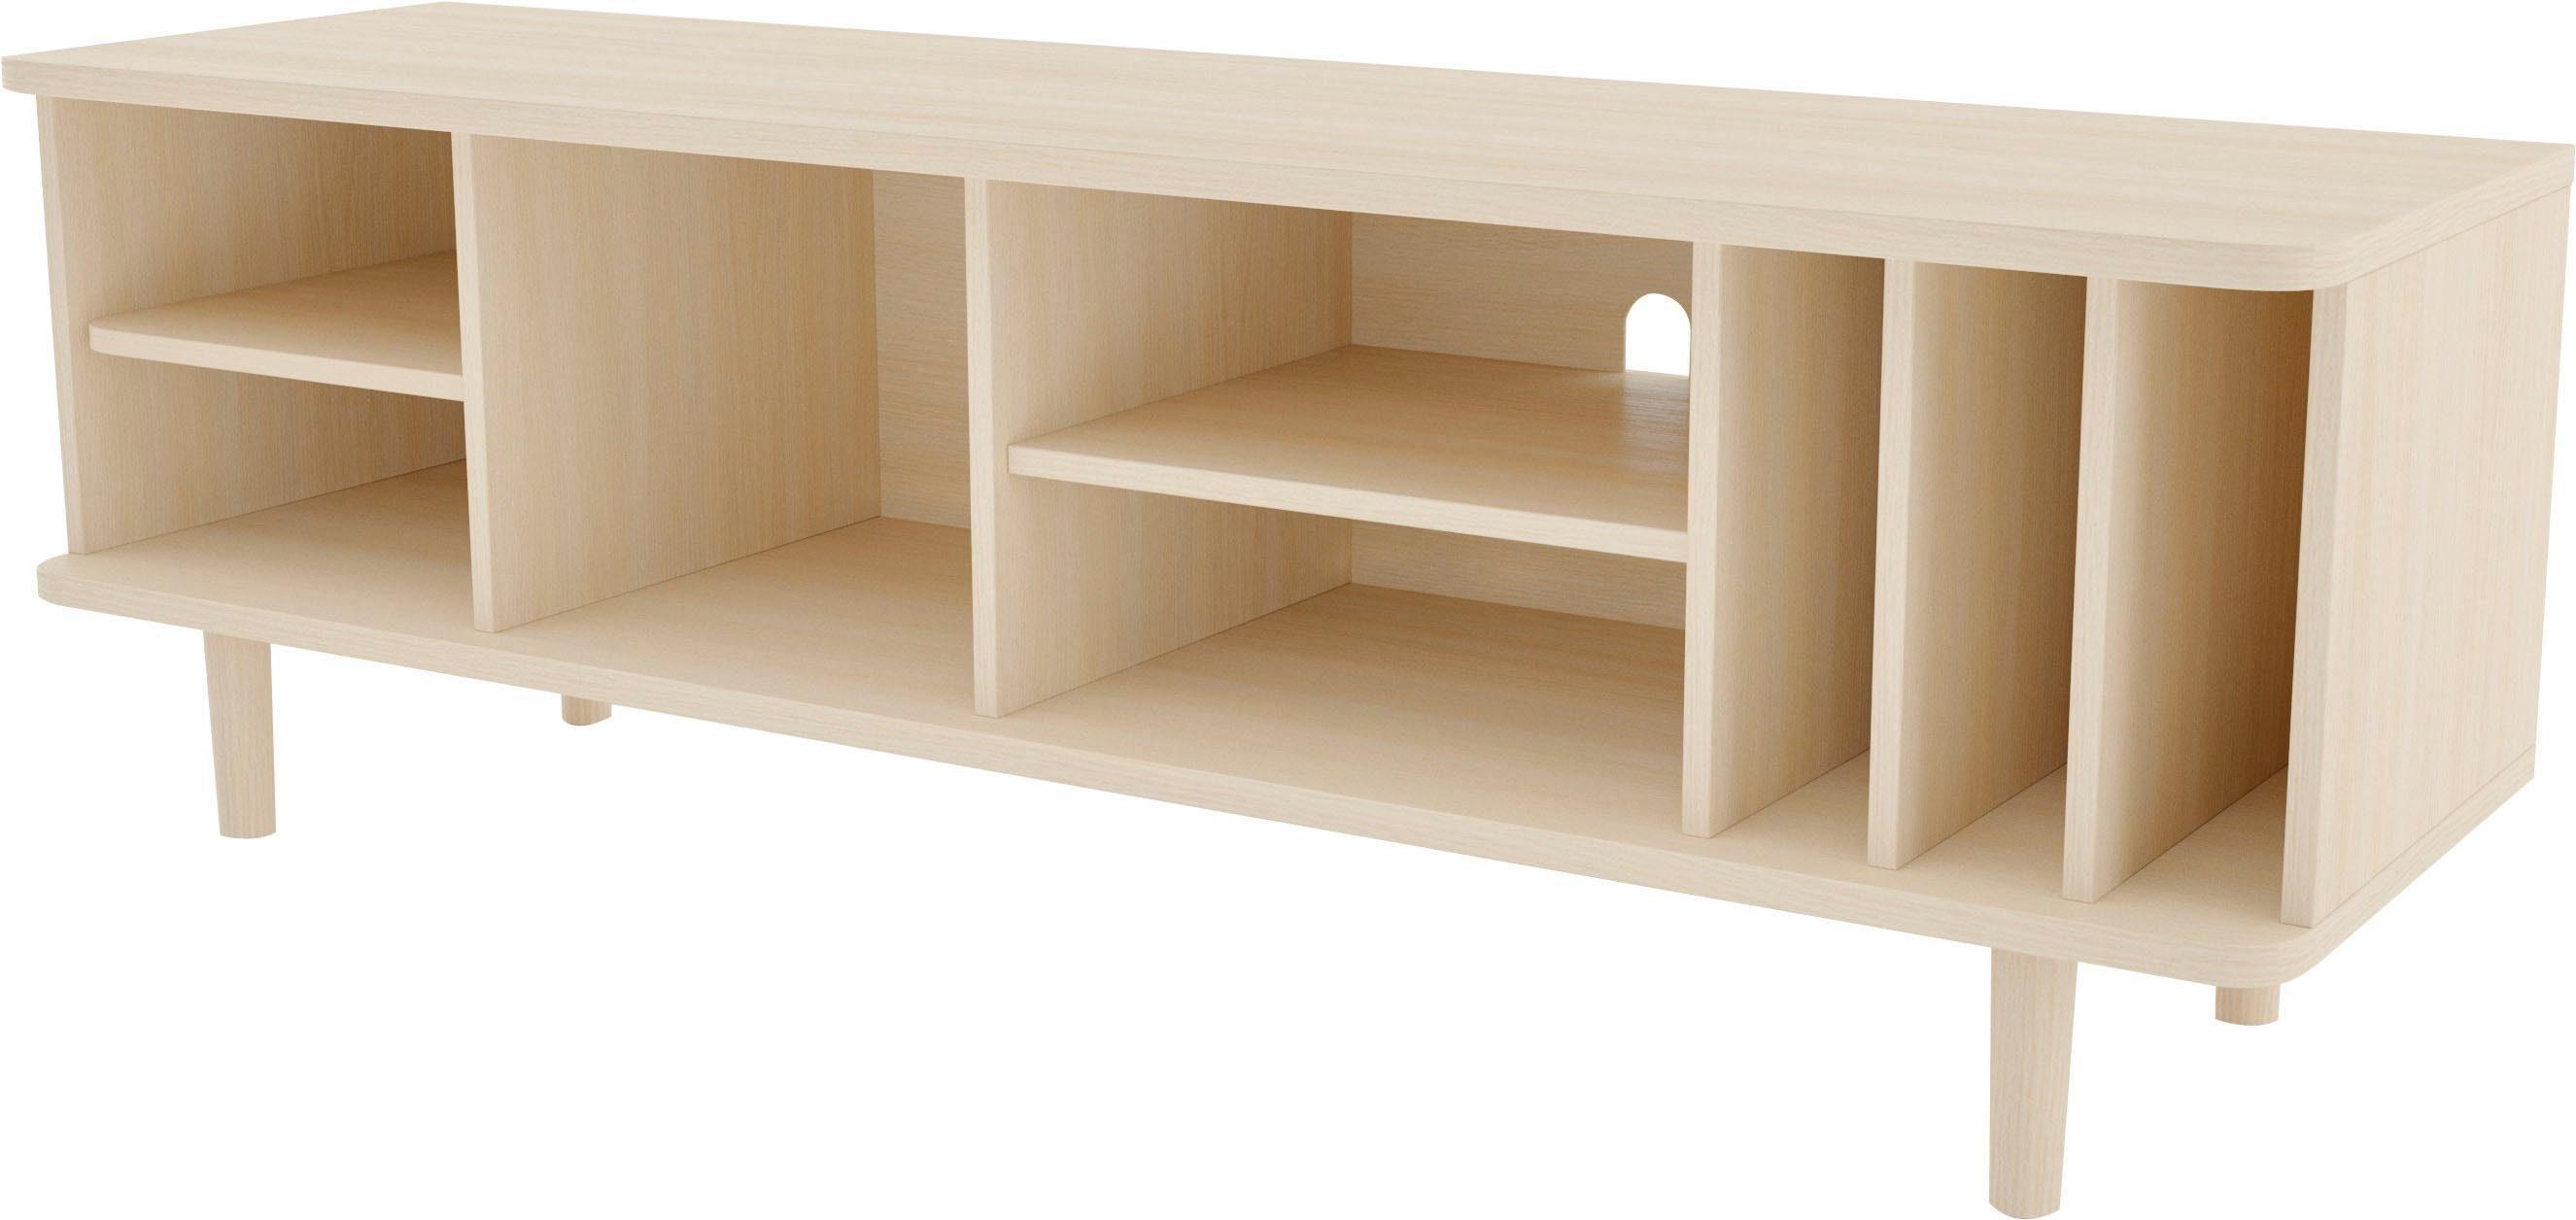 Woodman Lowboard »Malic«, Breite 160 cm